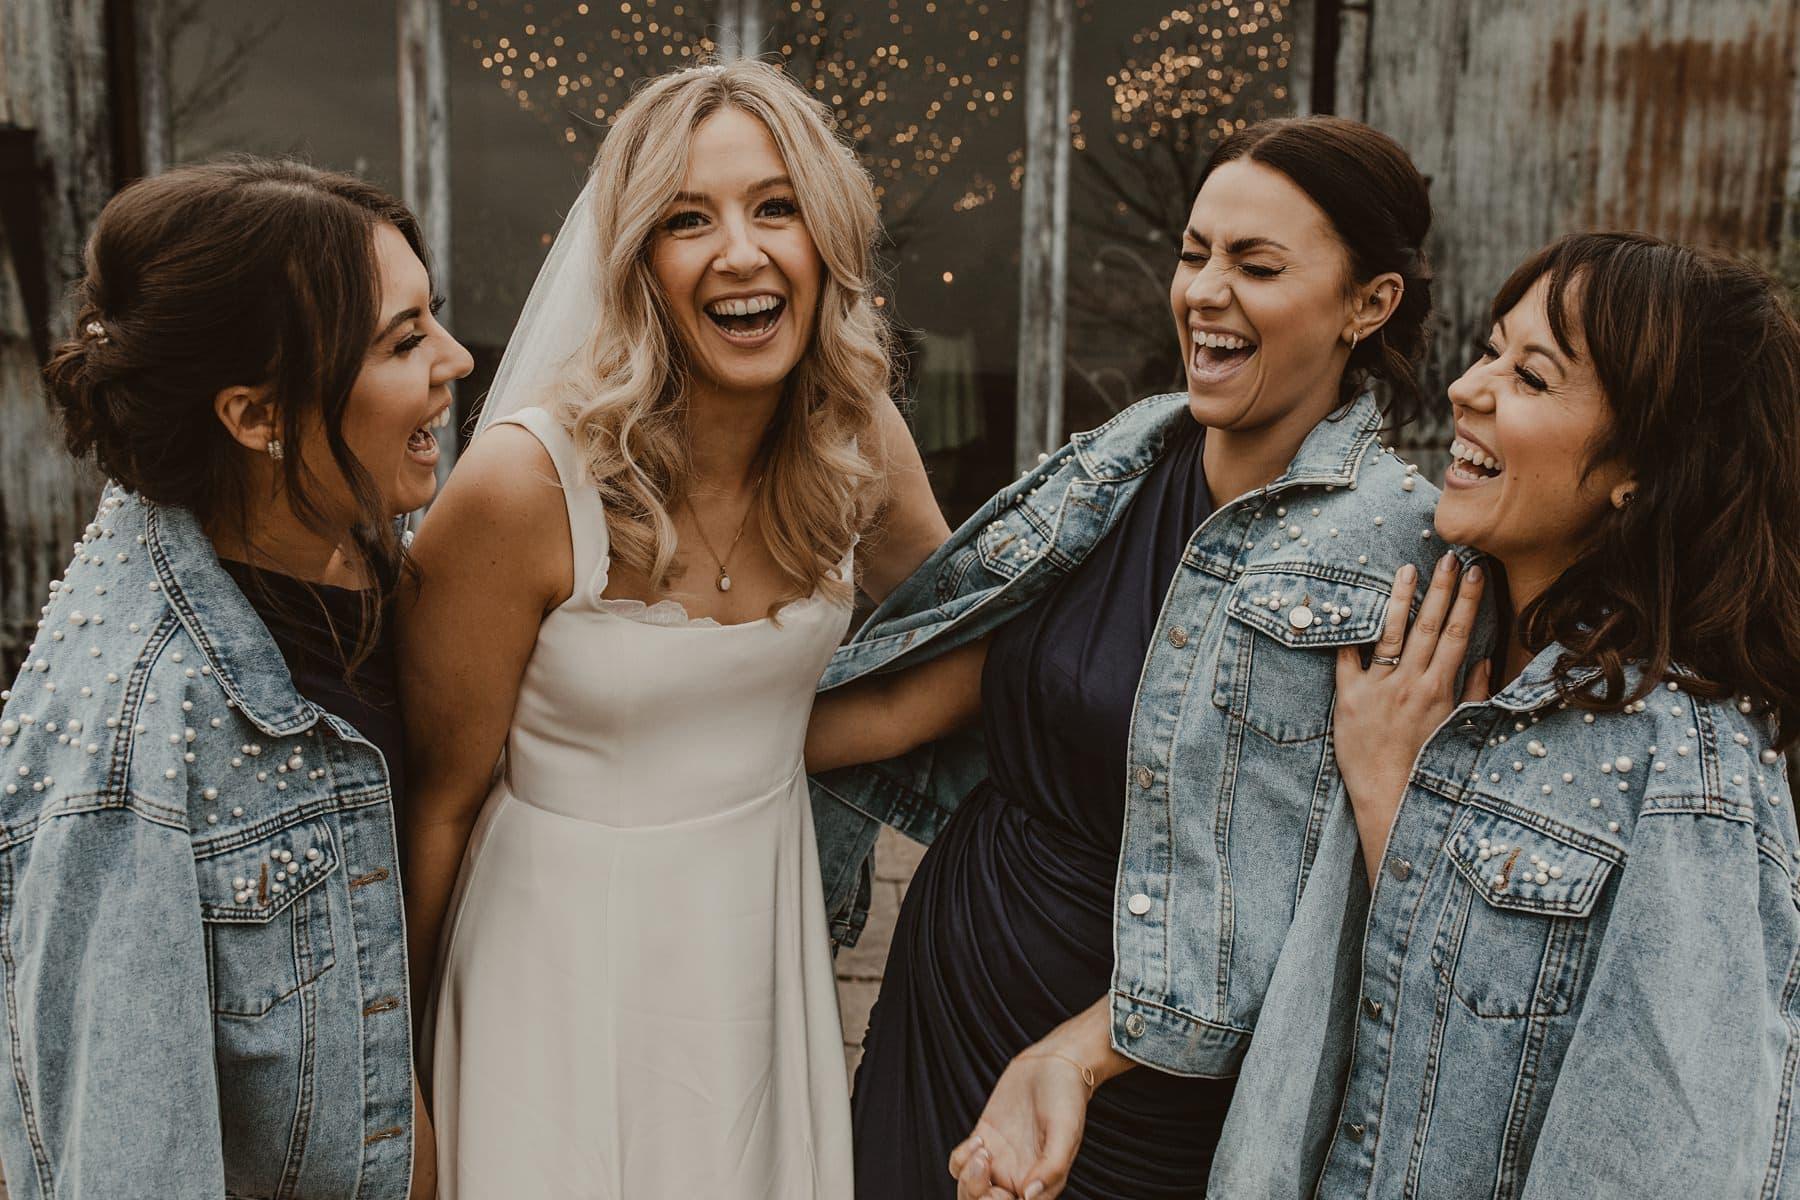 Bride and bridesmaids wearing denim jackets